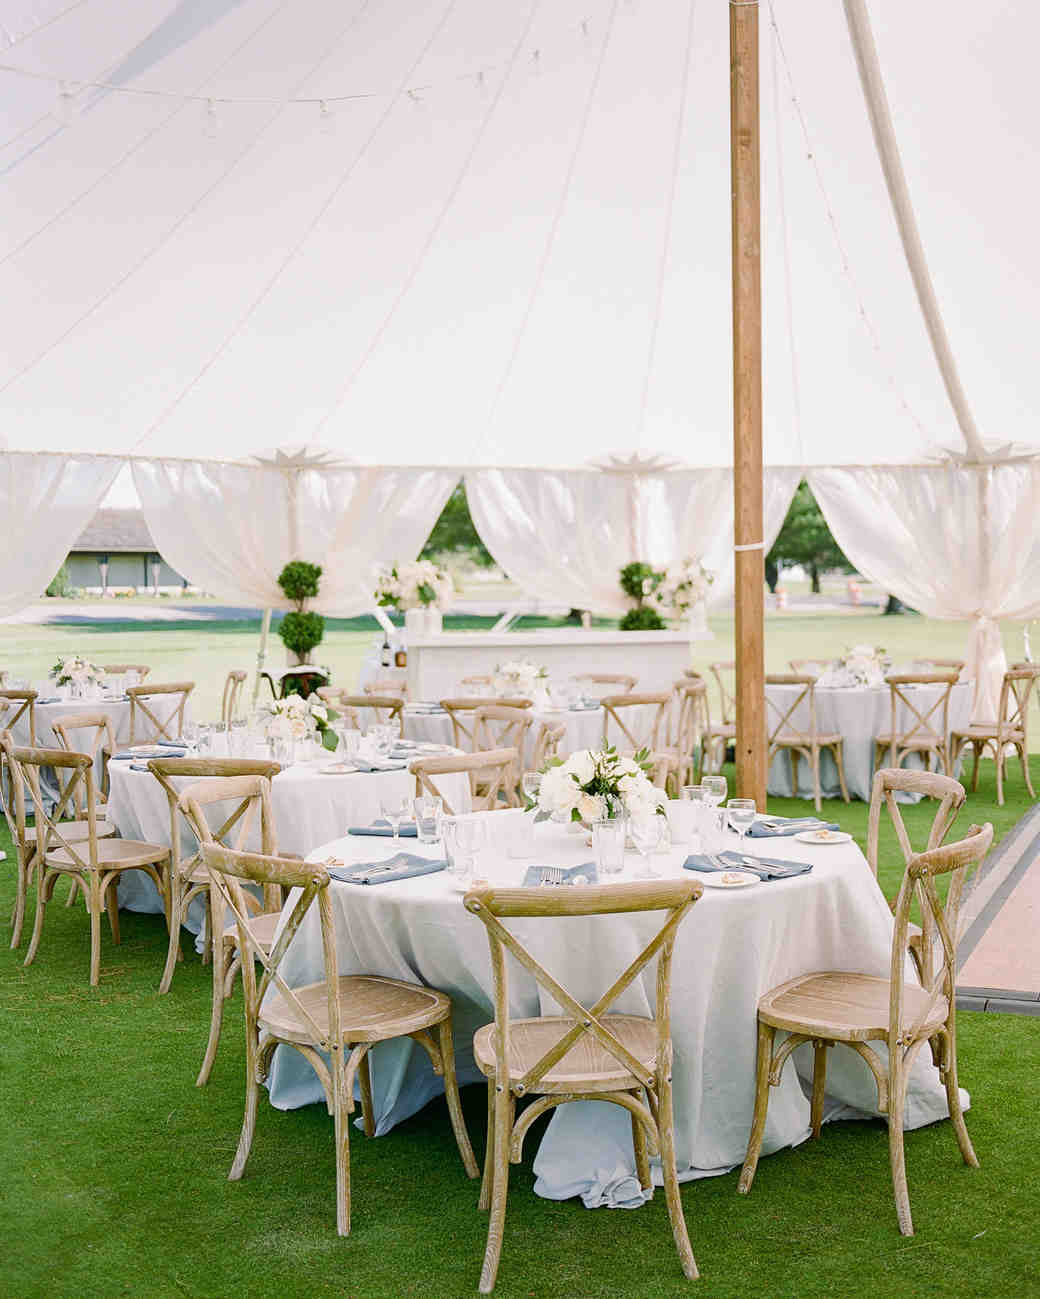 izzy tom wedding tent